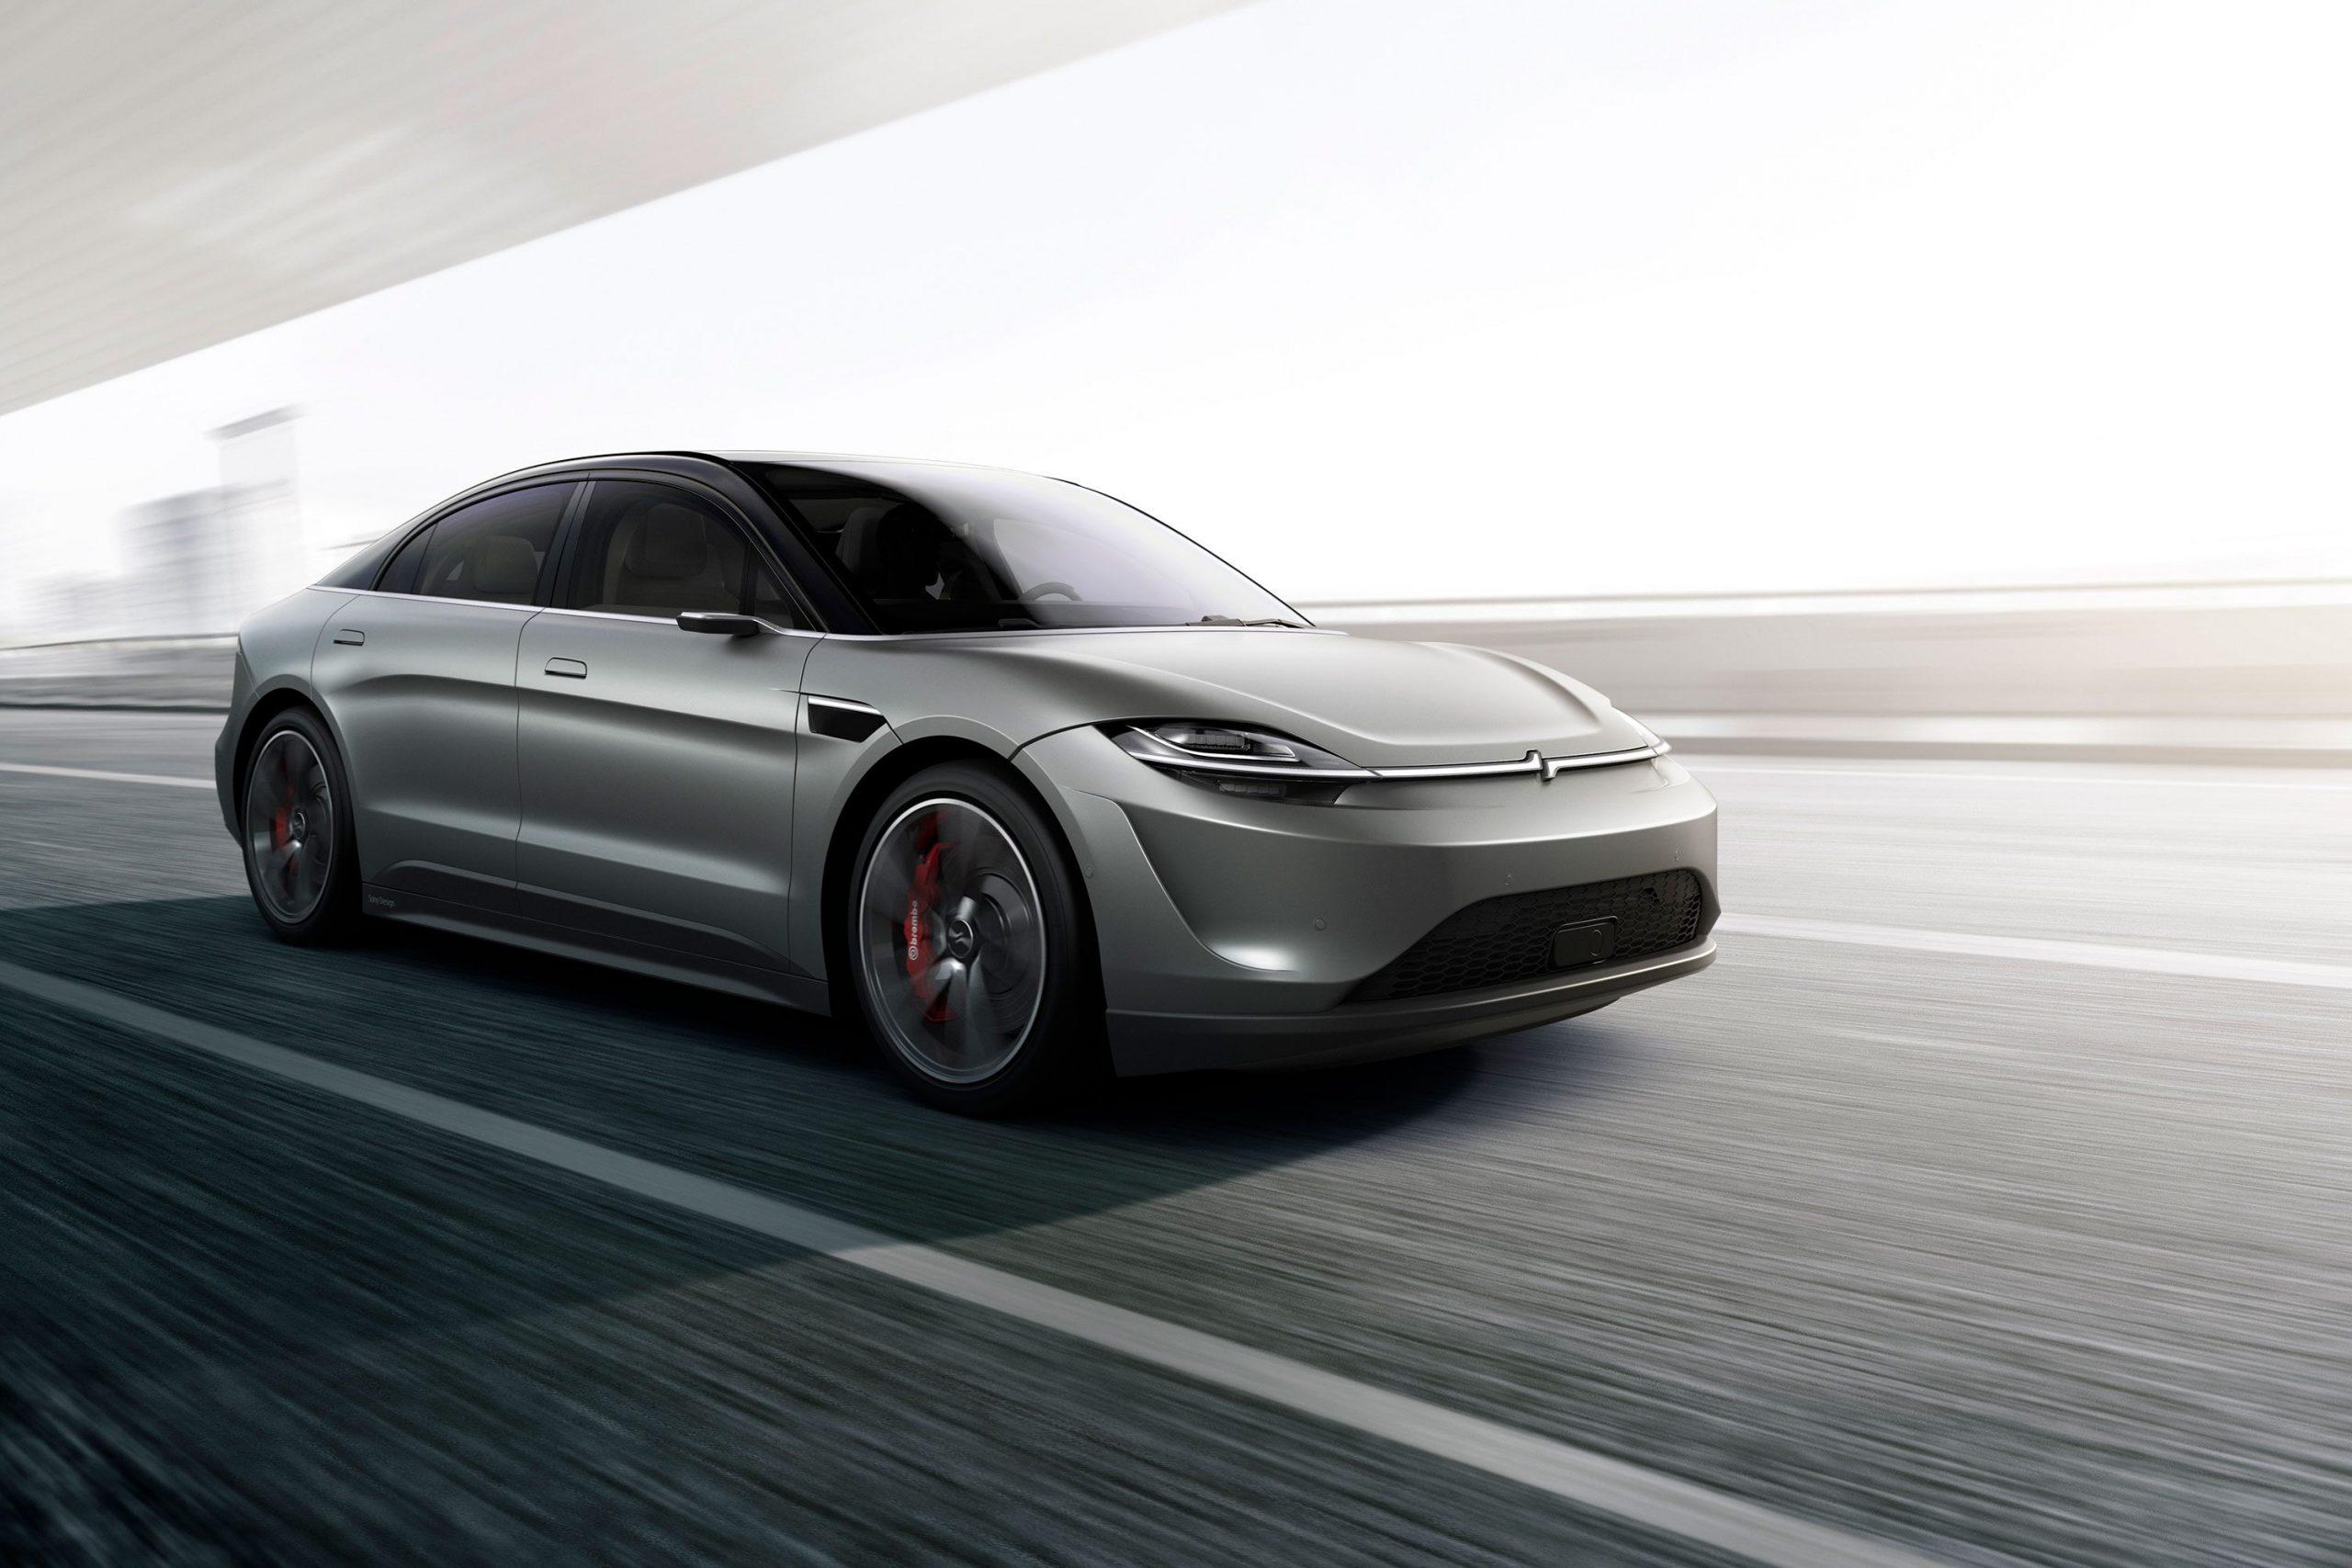 CES 2020: Sony Vision-S Concept Car Unveiled 5